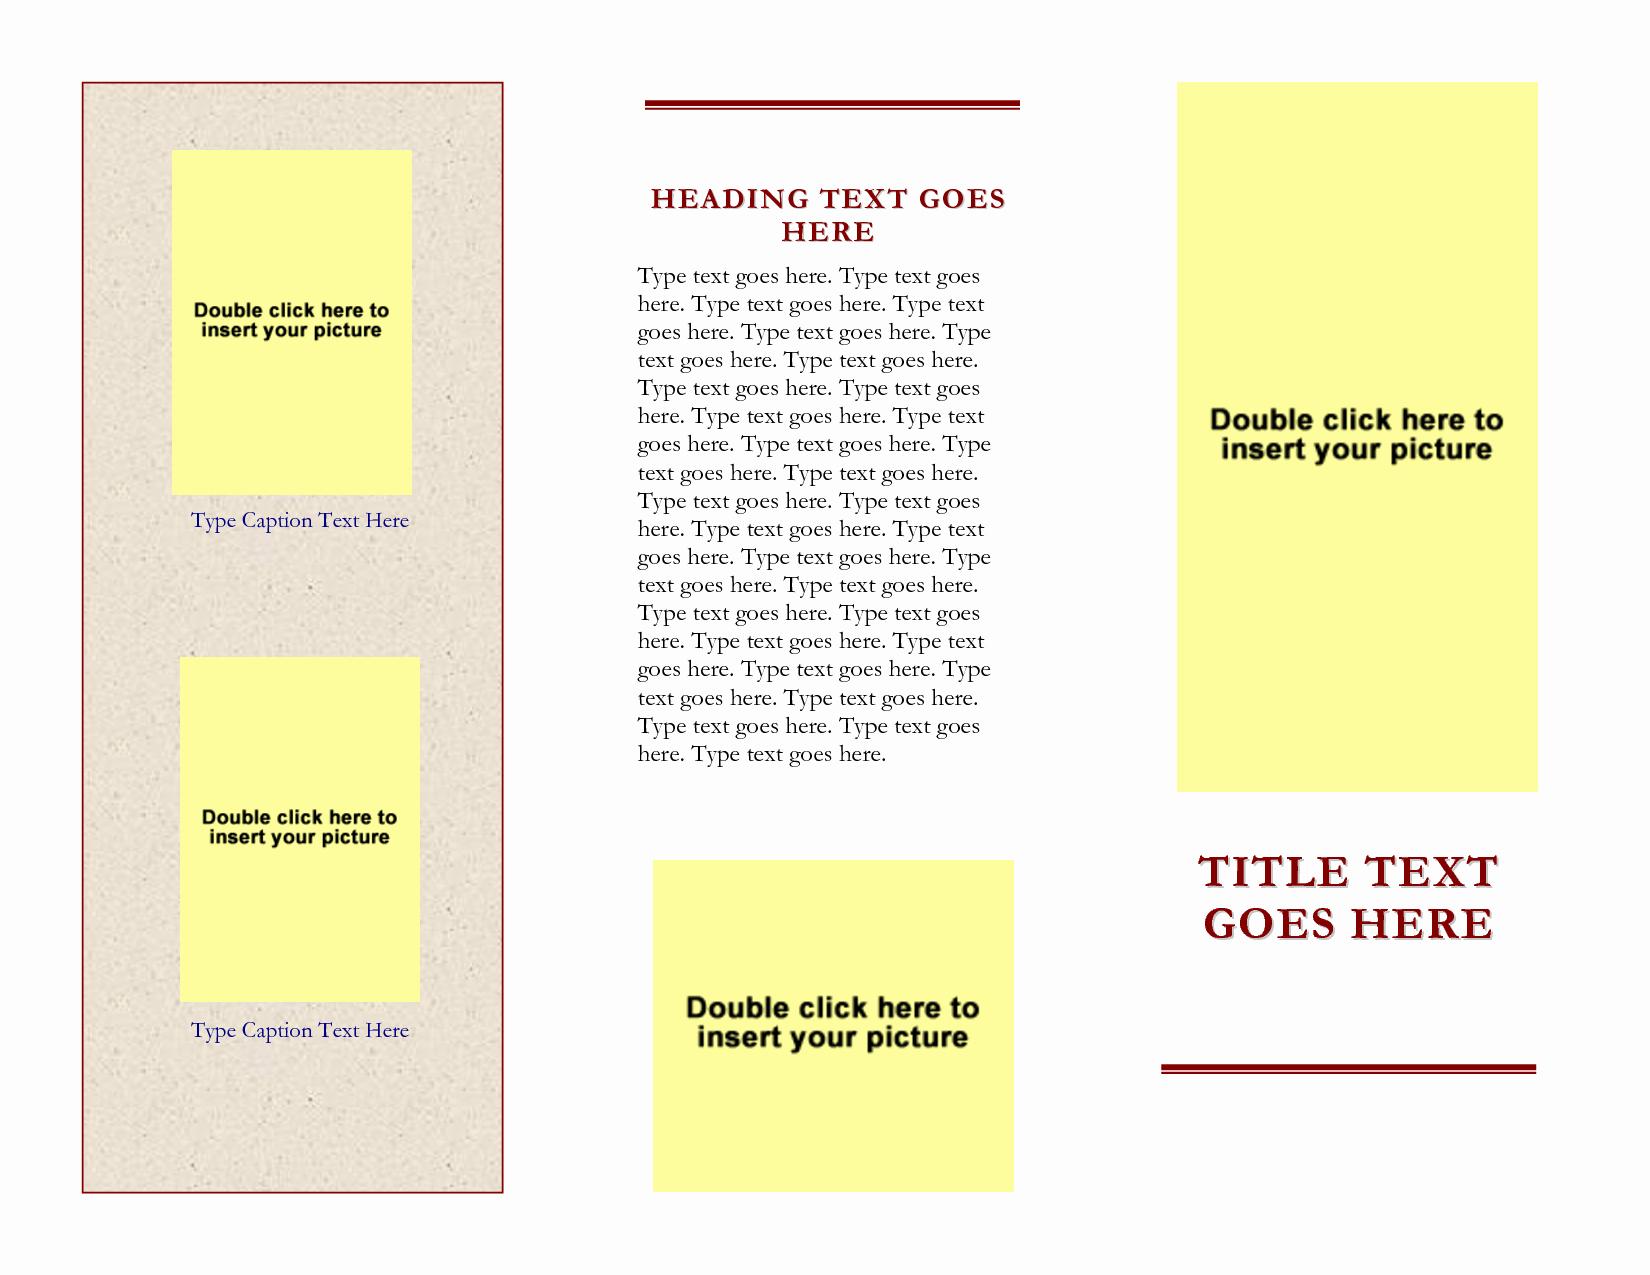 3 Fold Brochure Template Word Luxury Free Tri Fold Brochure Templates for Word